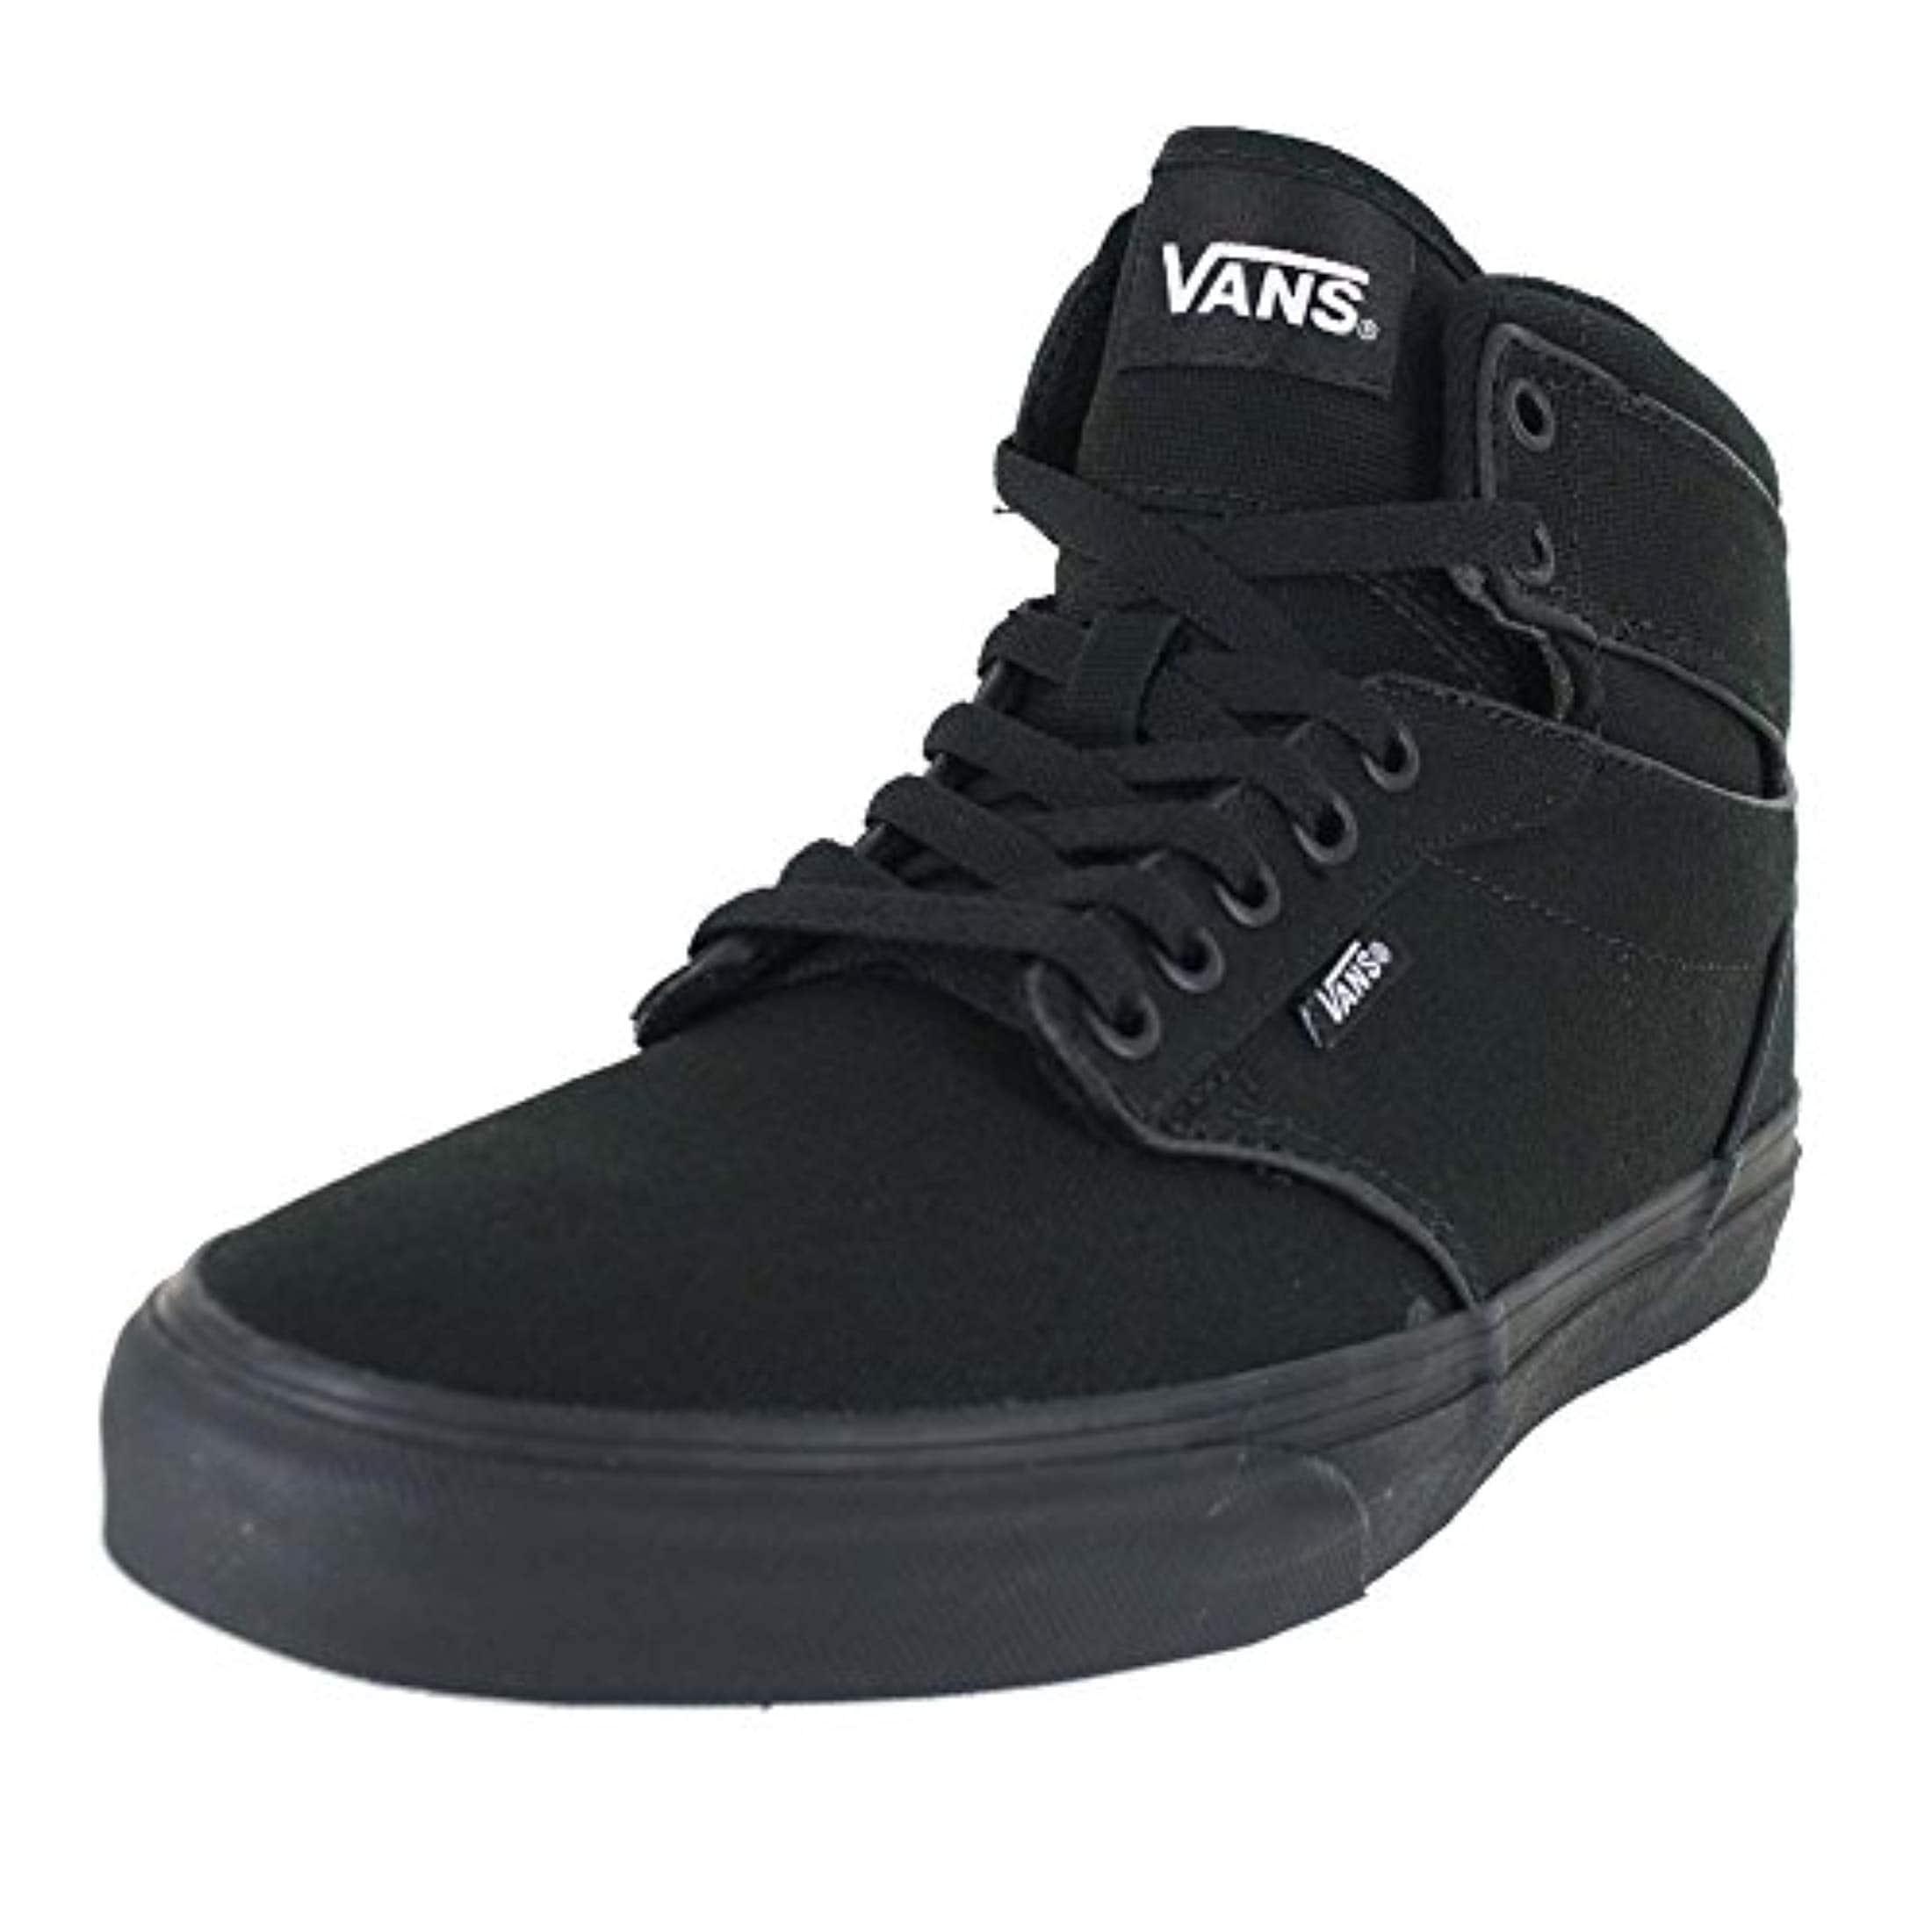 Vans Mens Atwood Hi Shoes Canvas Black Black Size 11.5